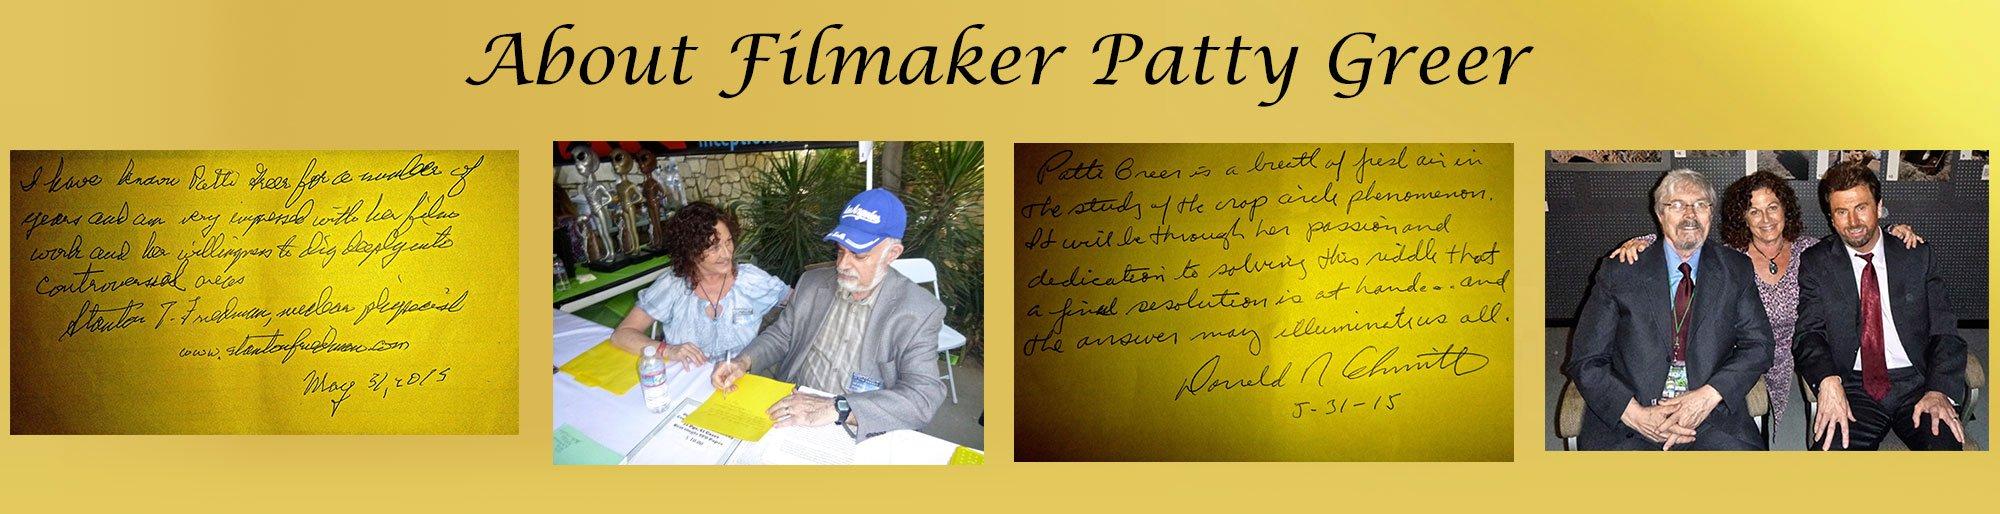 Patty Greer makes award winning films about crop circles.